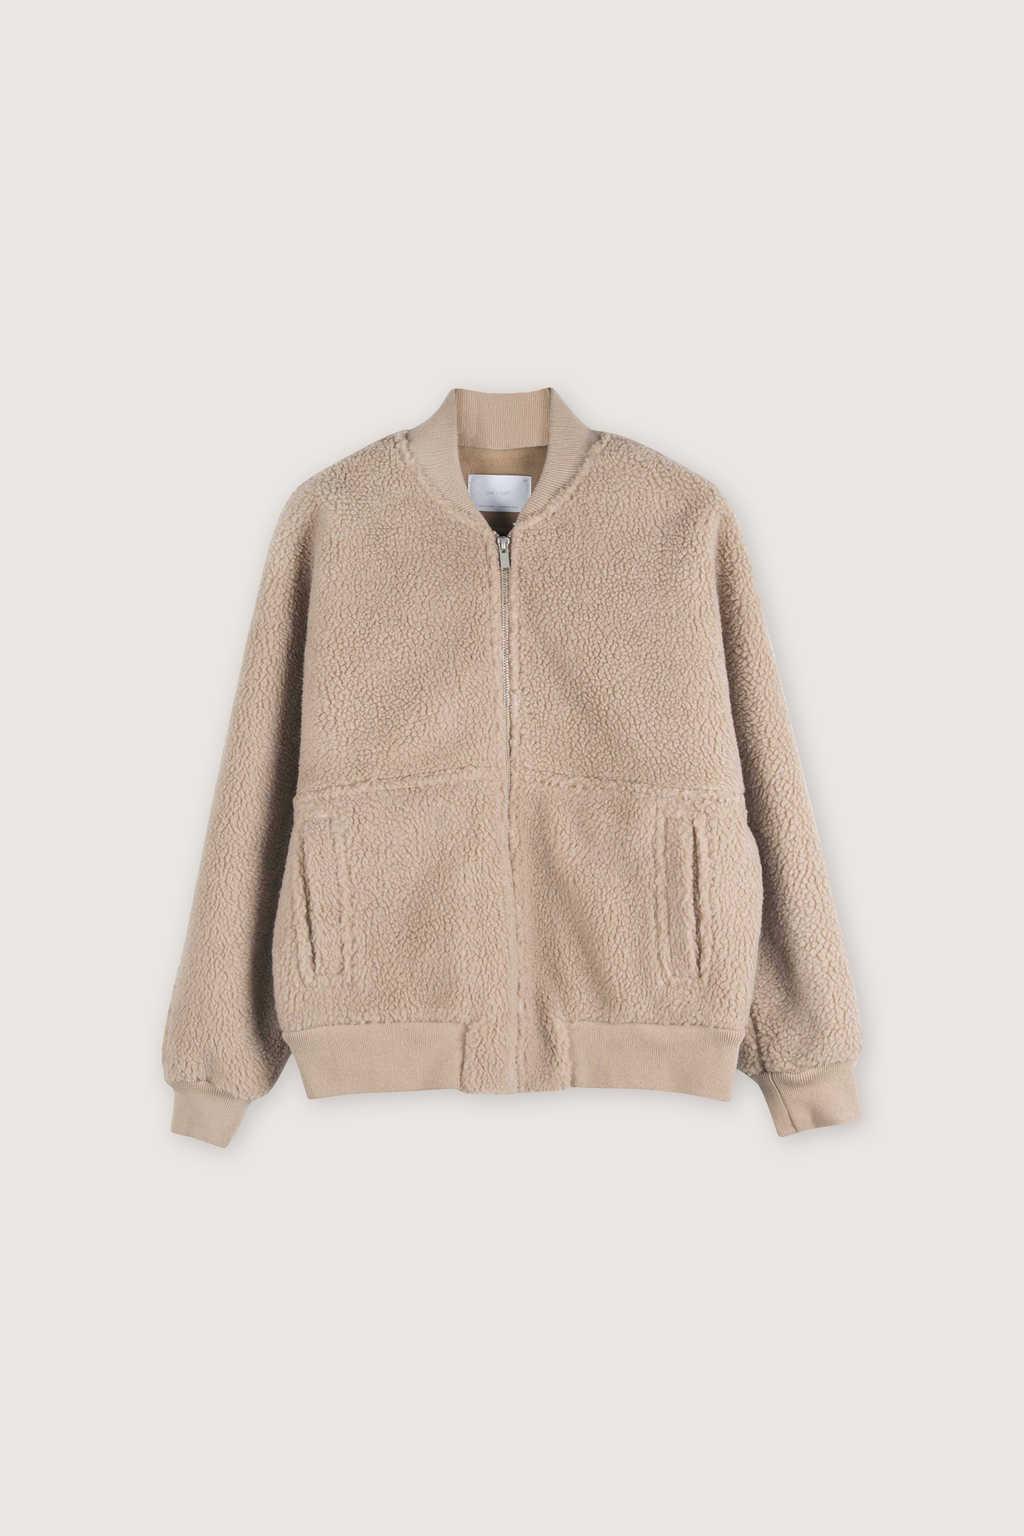 Jacket 1945 Camel 9